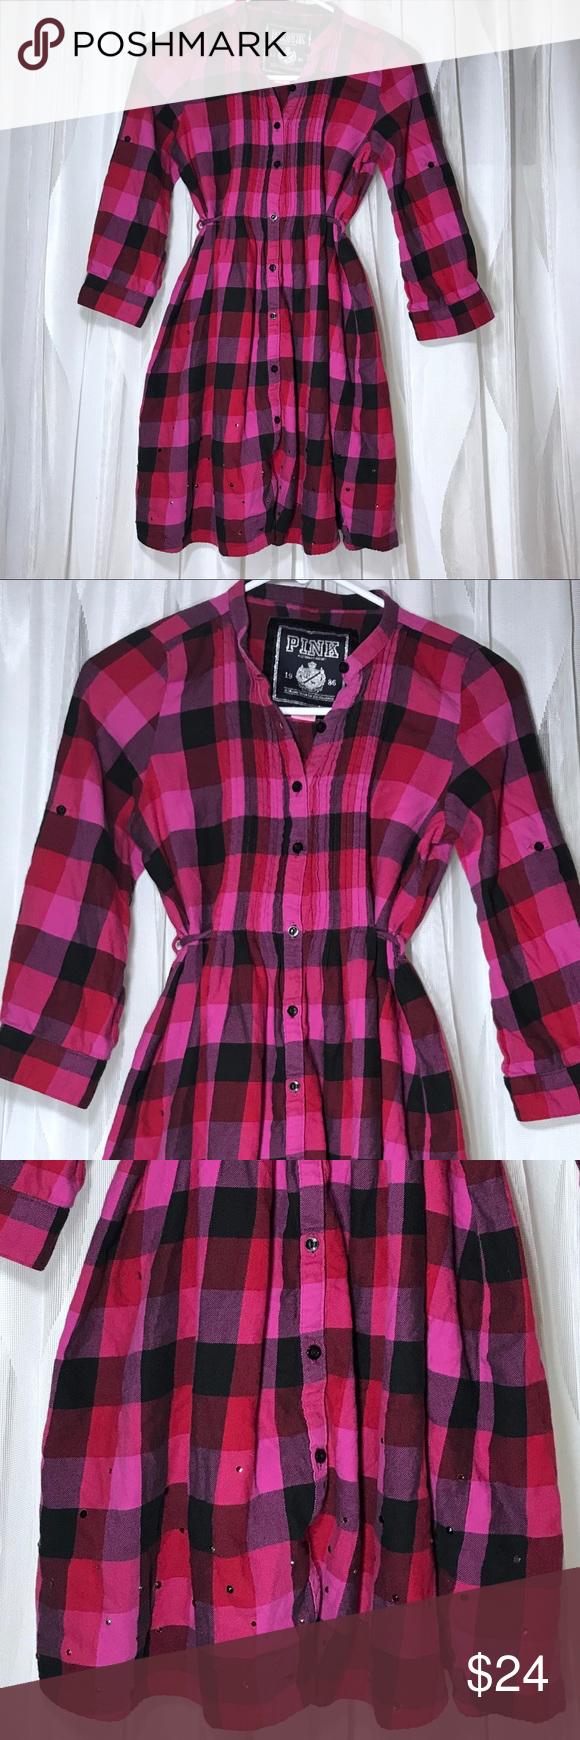 Flannel dress womens  Victoriaus Secret PINK Flannel Dress u Small  Flannels Red black